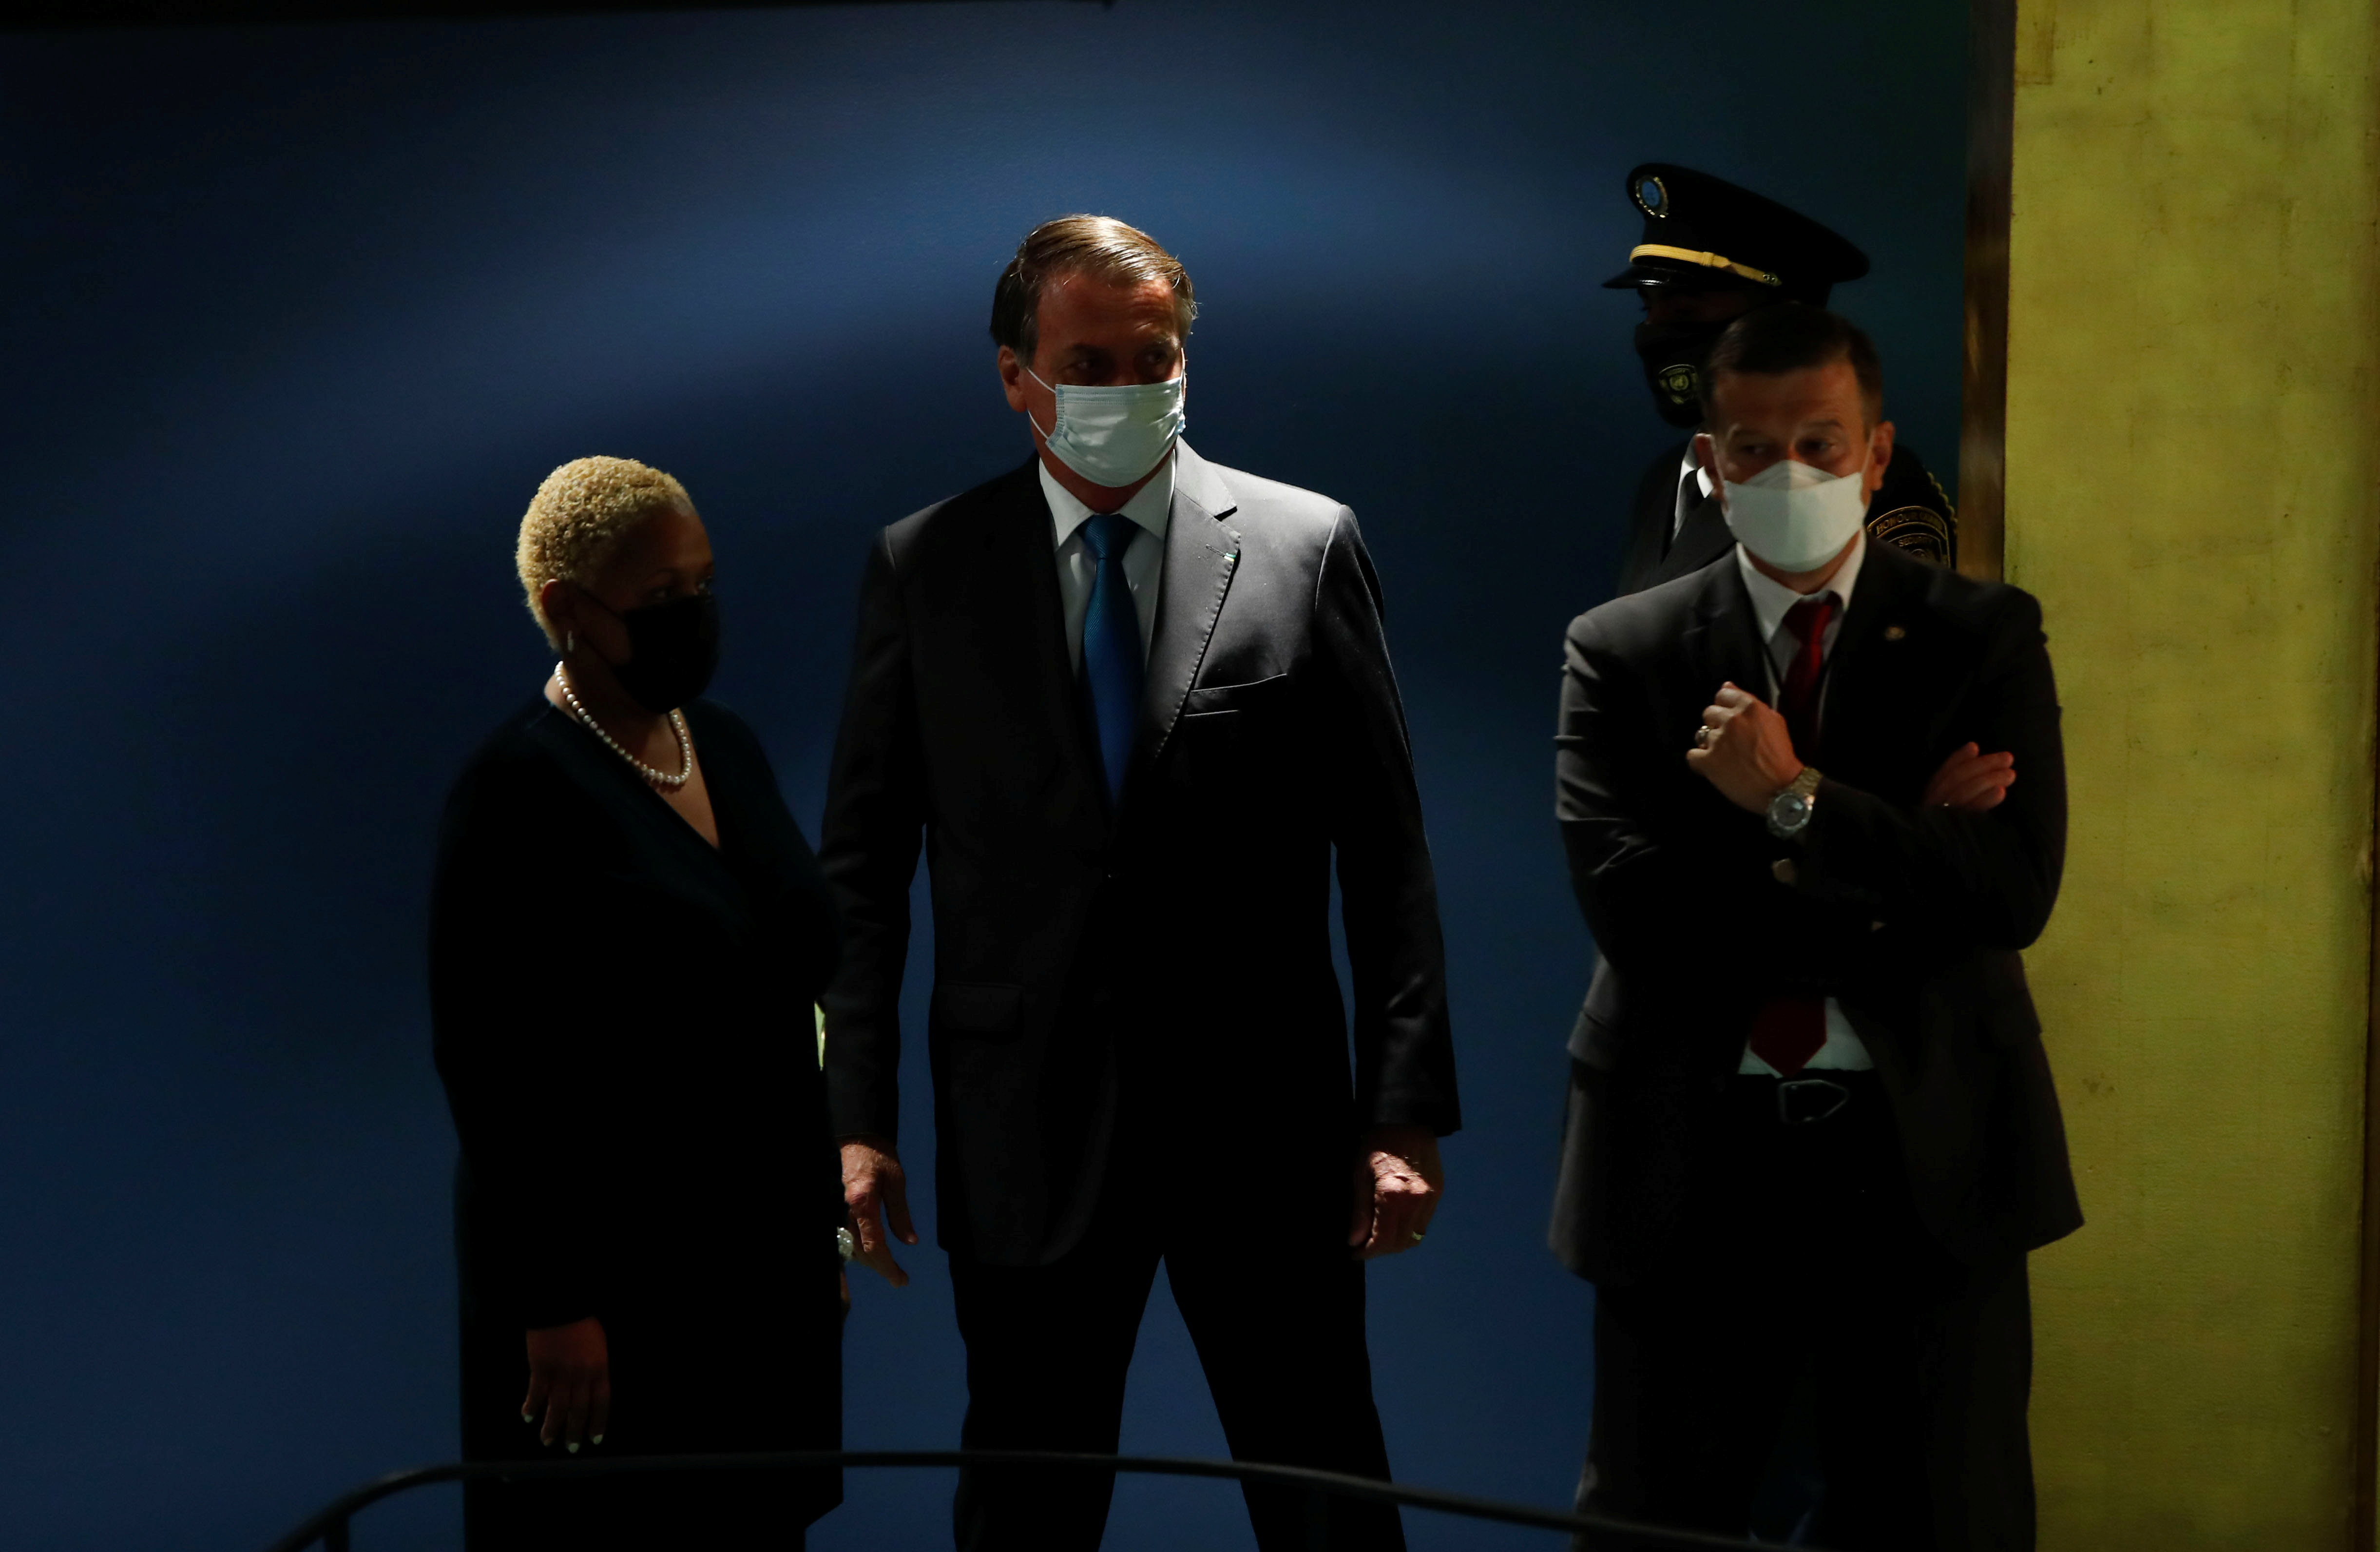 Brazil's President Jair Bolsonaro arrives to speak during the 76th Session of the U.N. General Assembly in New York City, U.S., September 21, 2021.  REUTERS/Eduardo Munoz/Pool